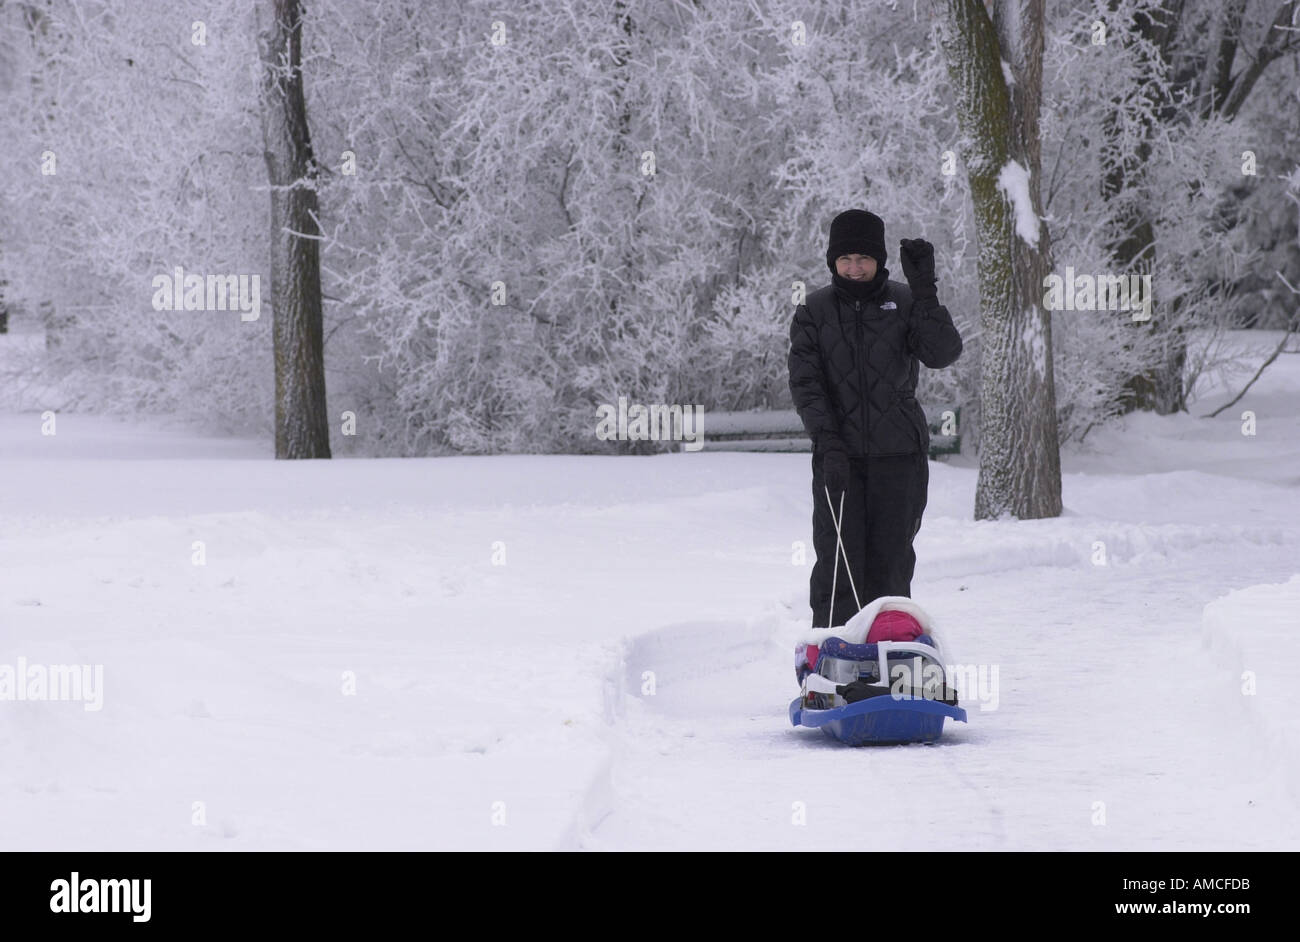 Winnipeg Winter Scenes Stock Photo: 1363930 - Alamy